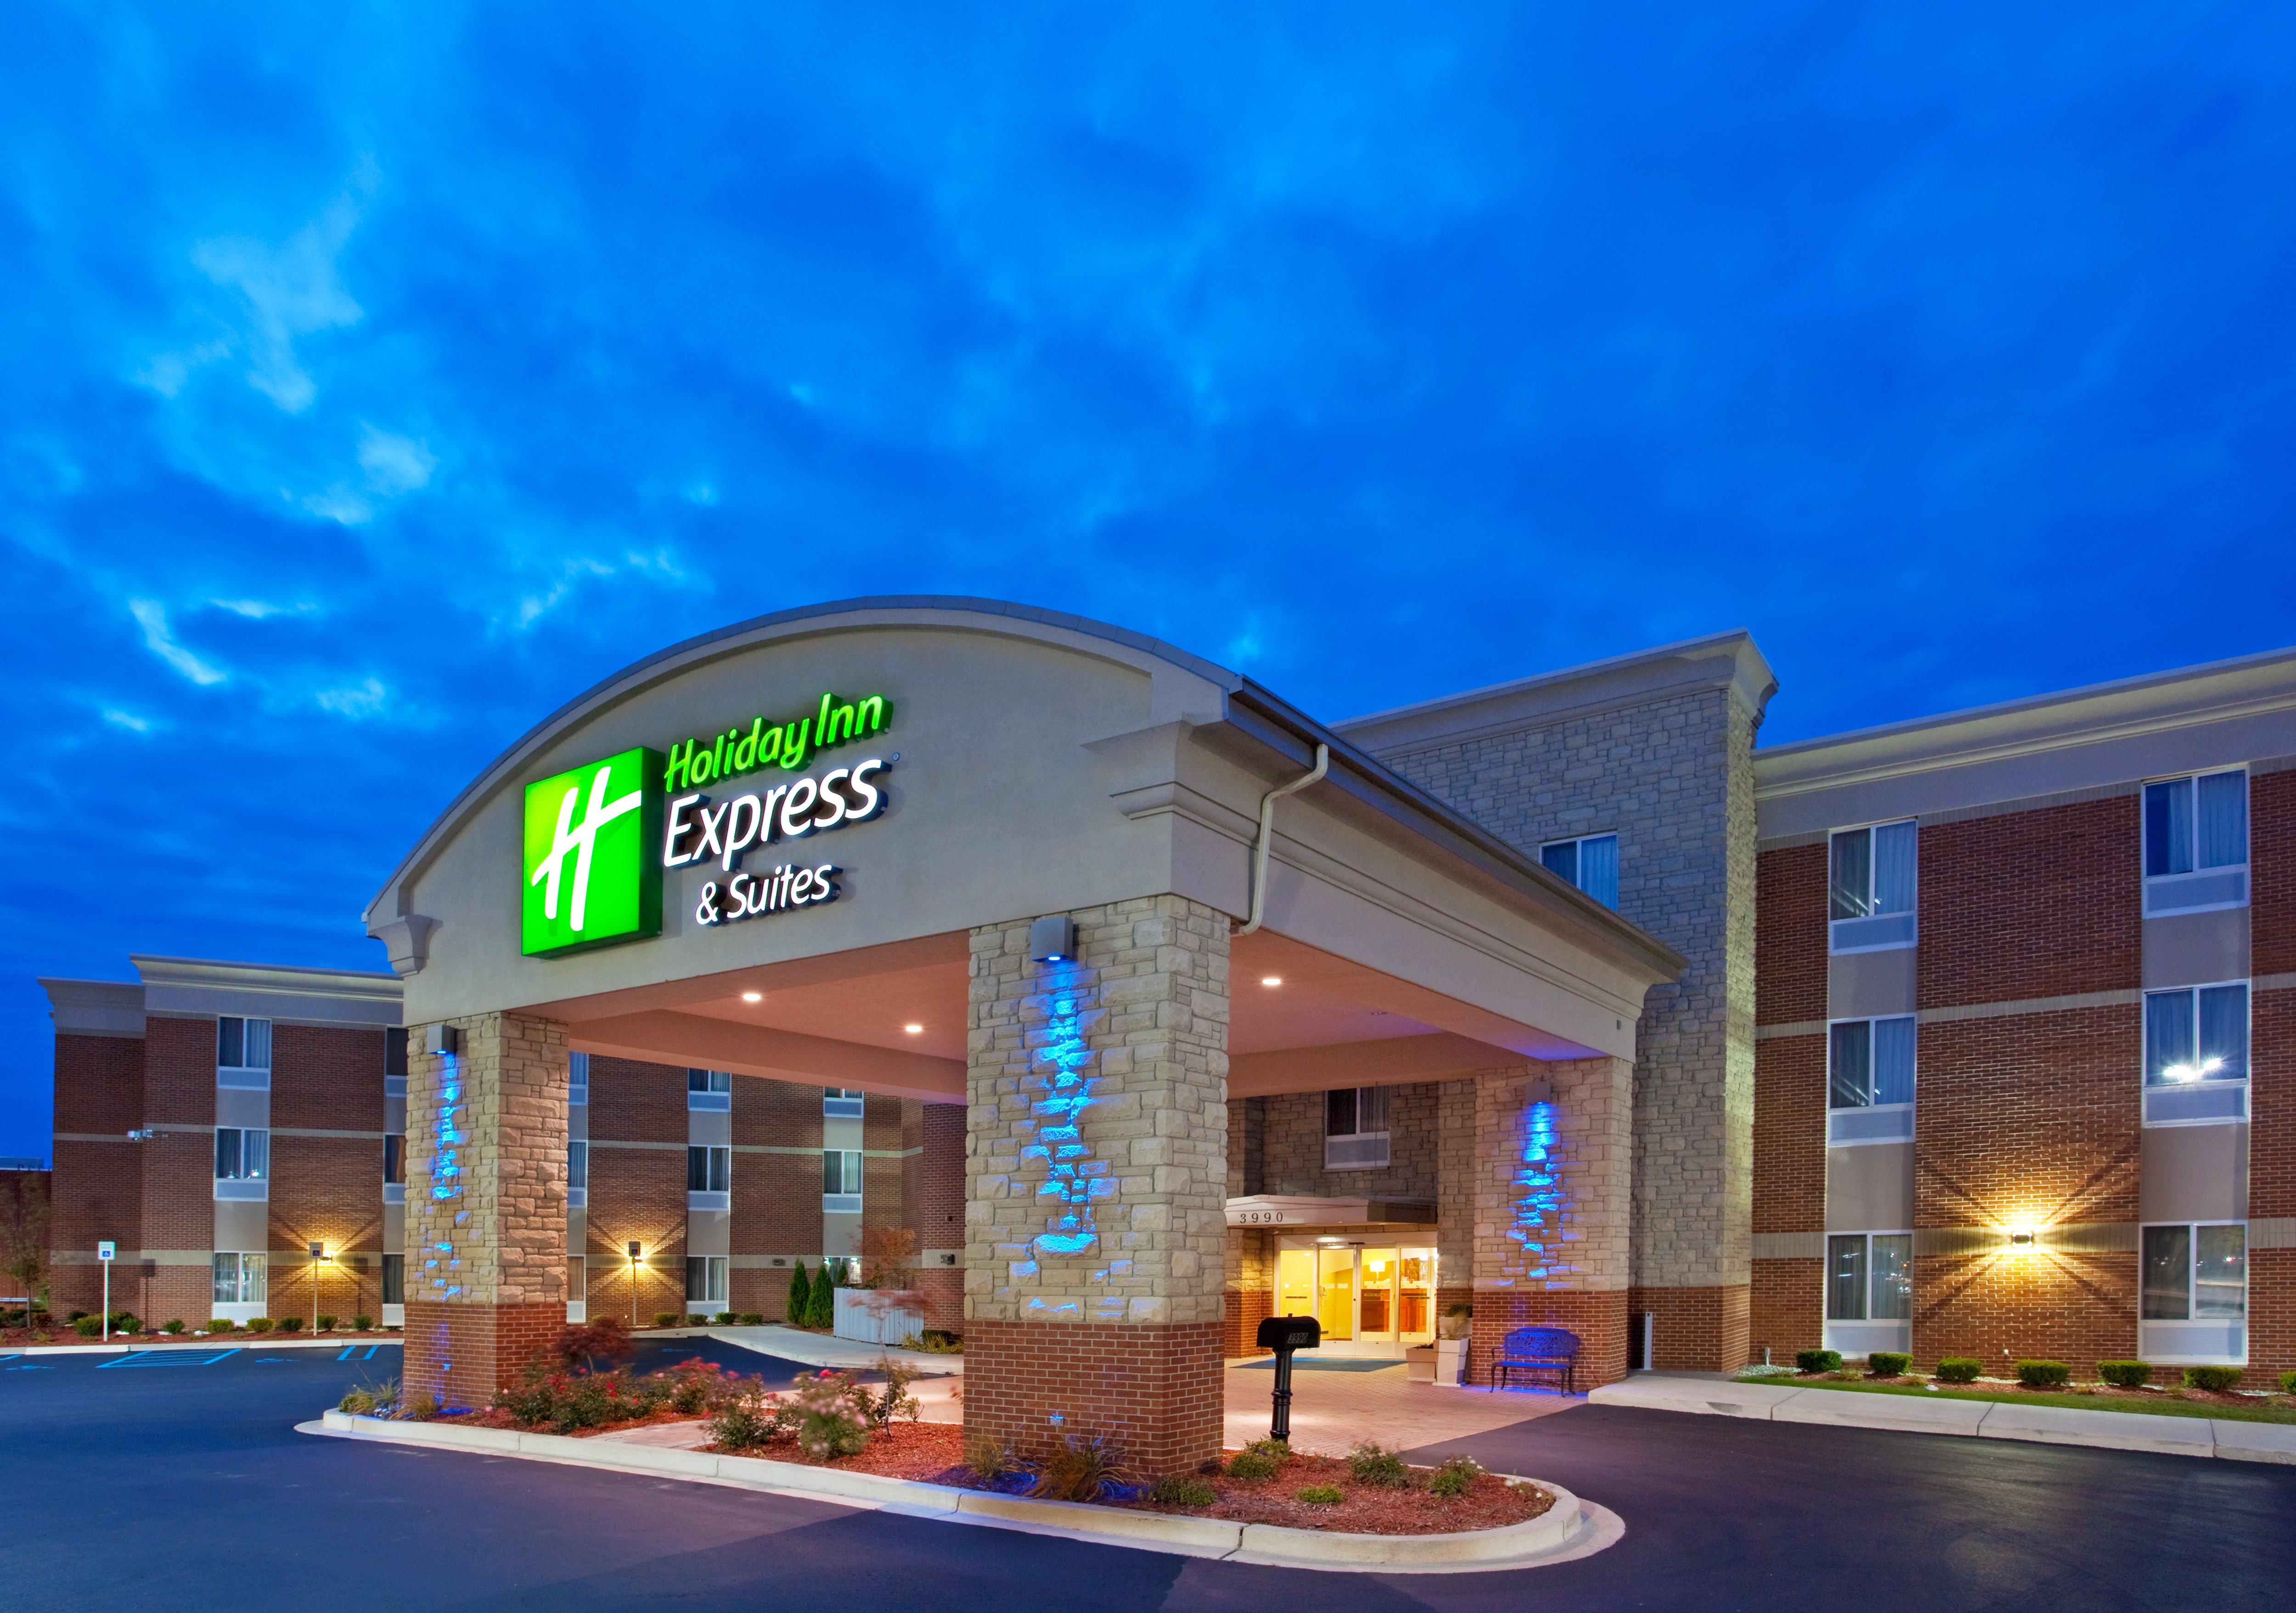 Holiday Inn Express/Suites Auburn Hills